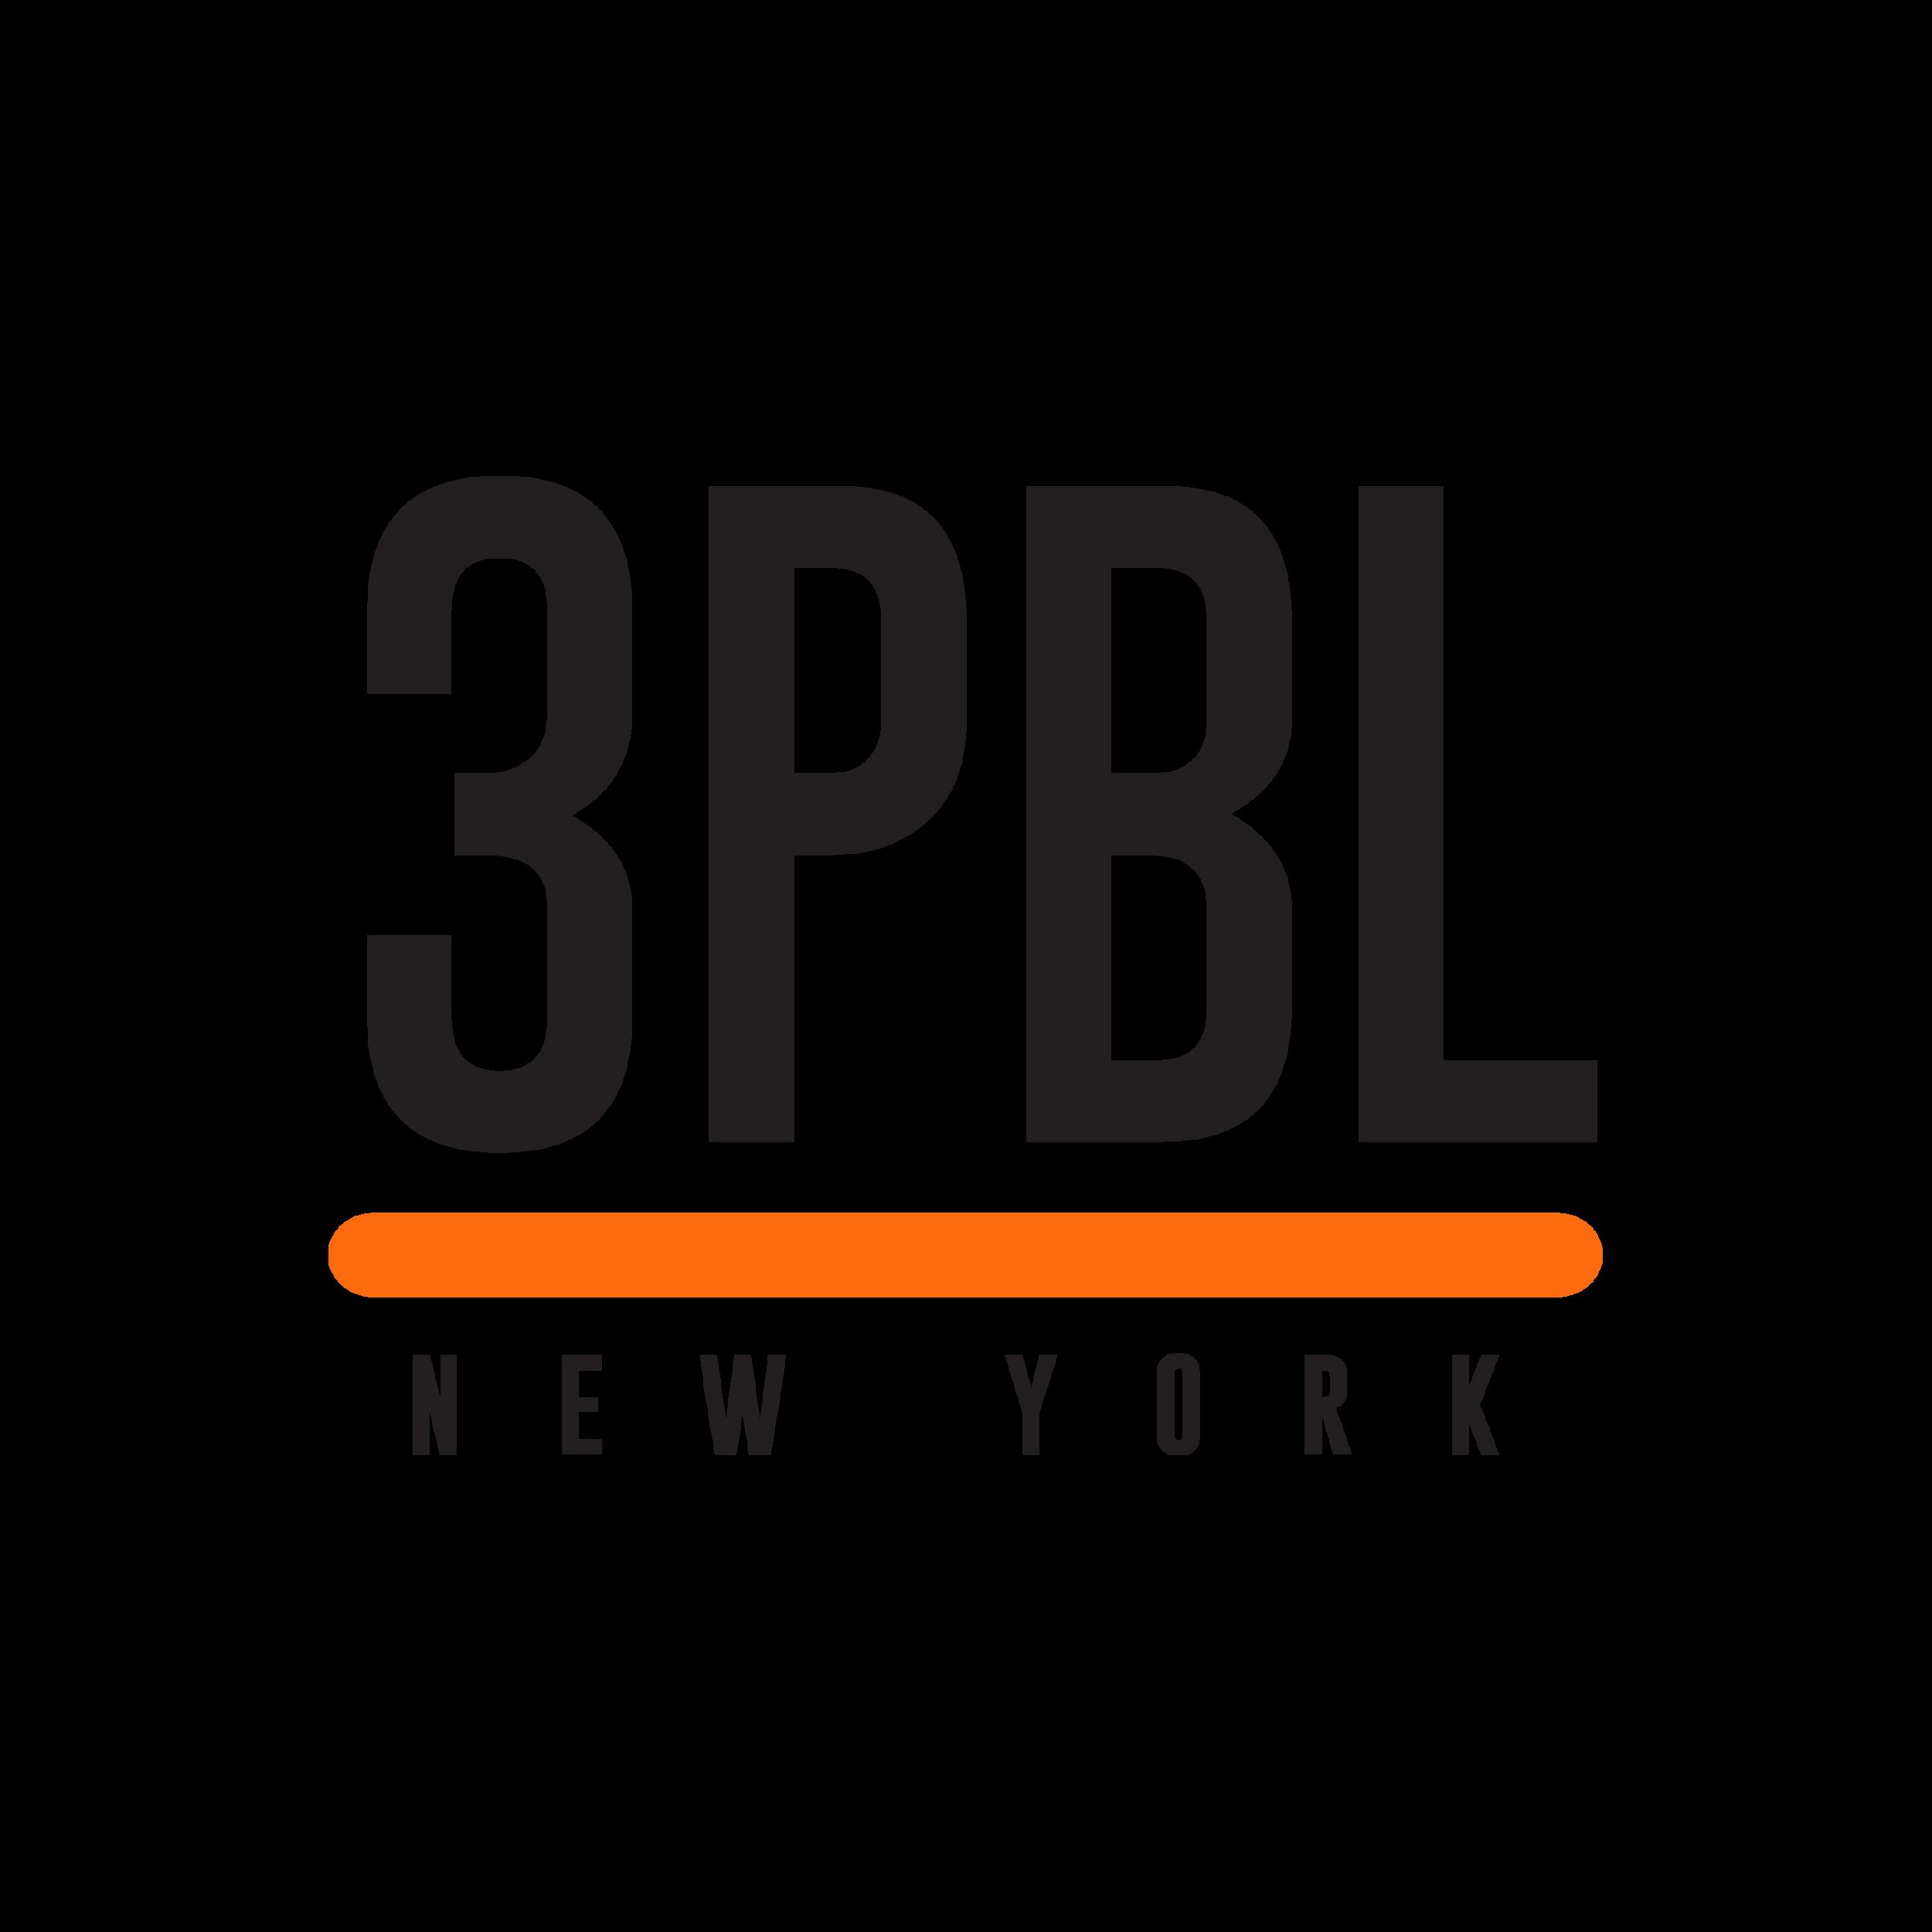 3PBL_LOGO_LIGHTGROUNDS.png